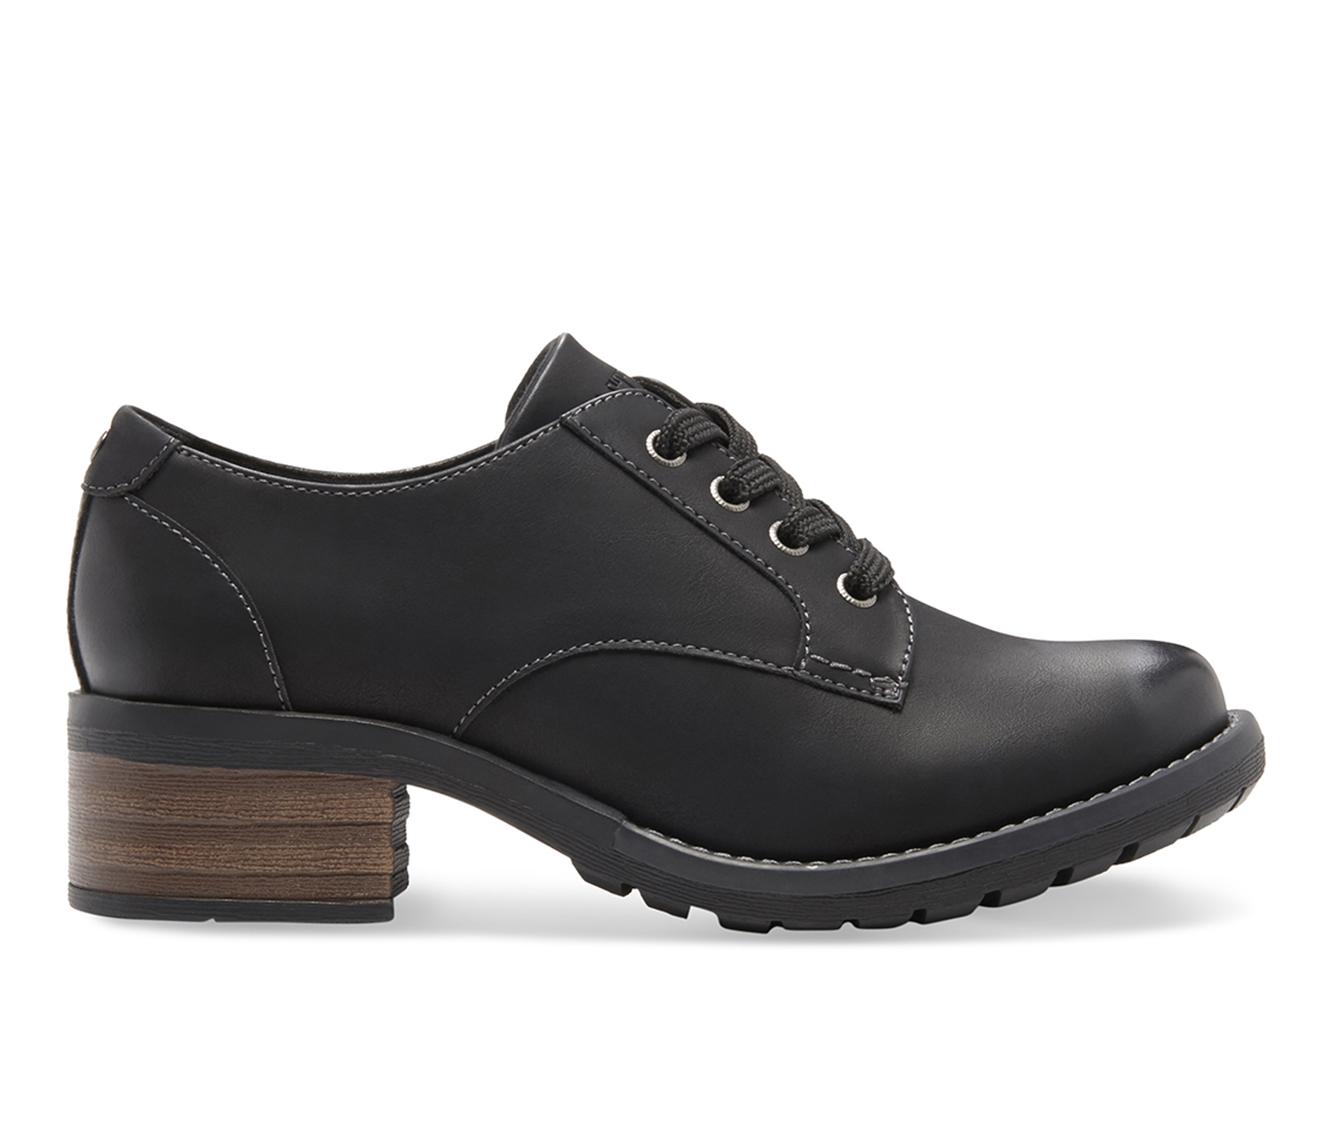 Eastland Trish Women's Shoe (Black Leather)